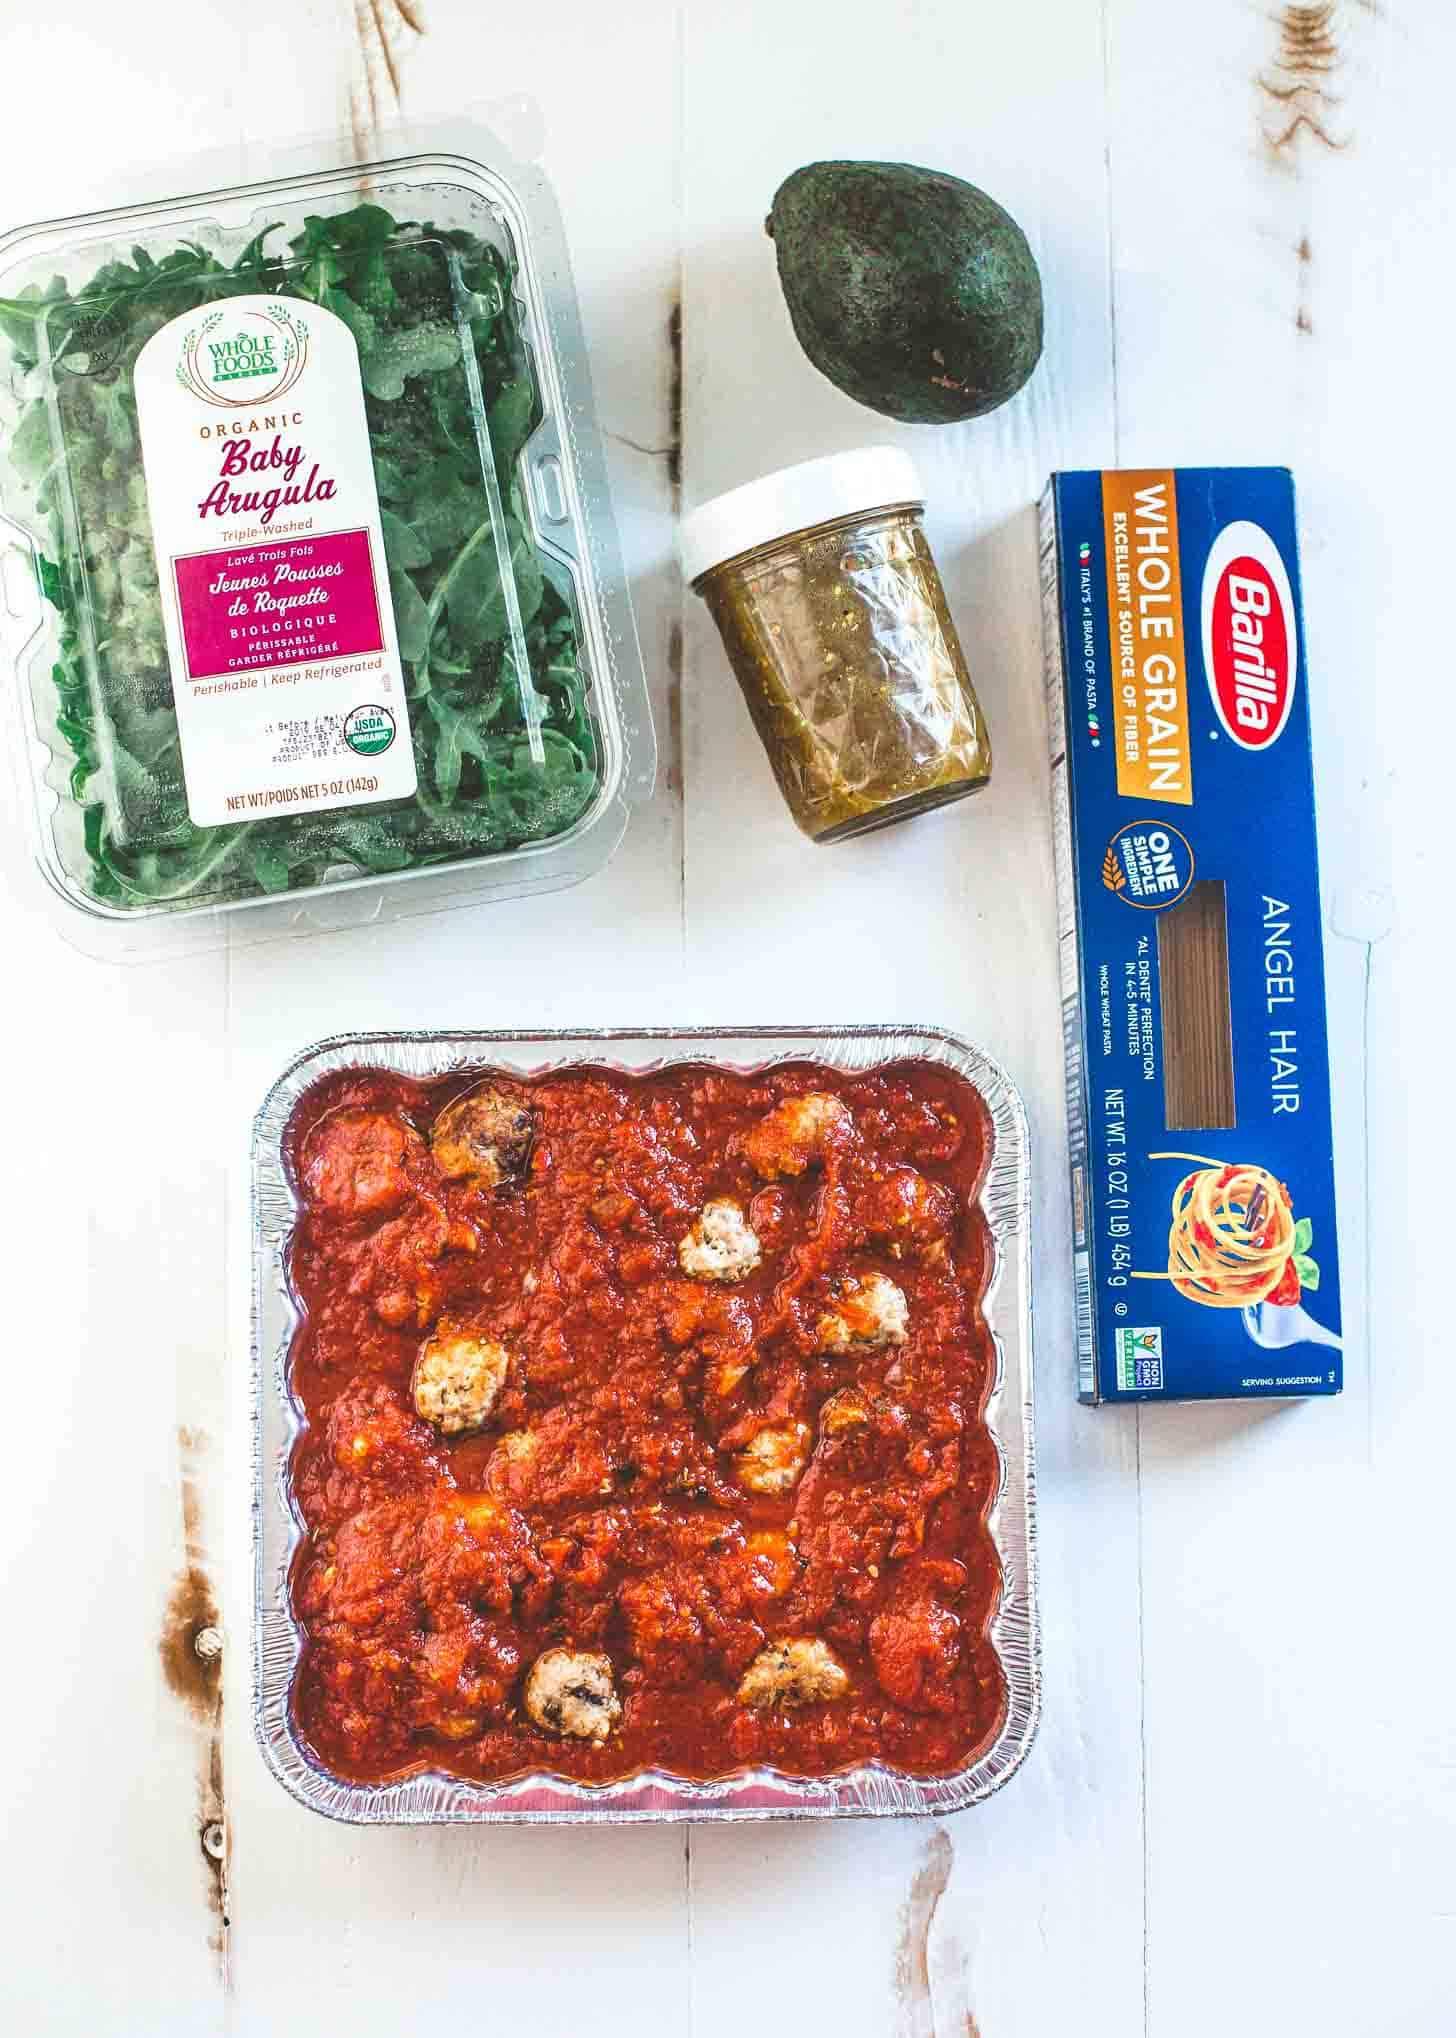 Italian Turkey Meatballs with sauce, pasta, salad kit and dressing